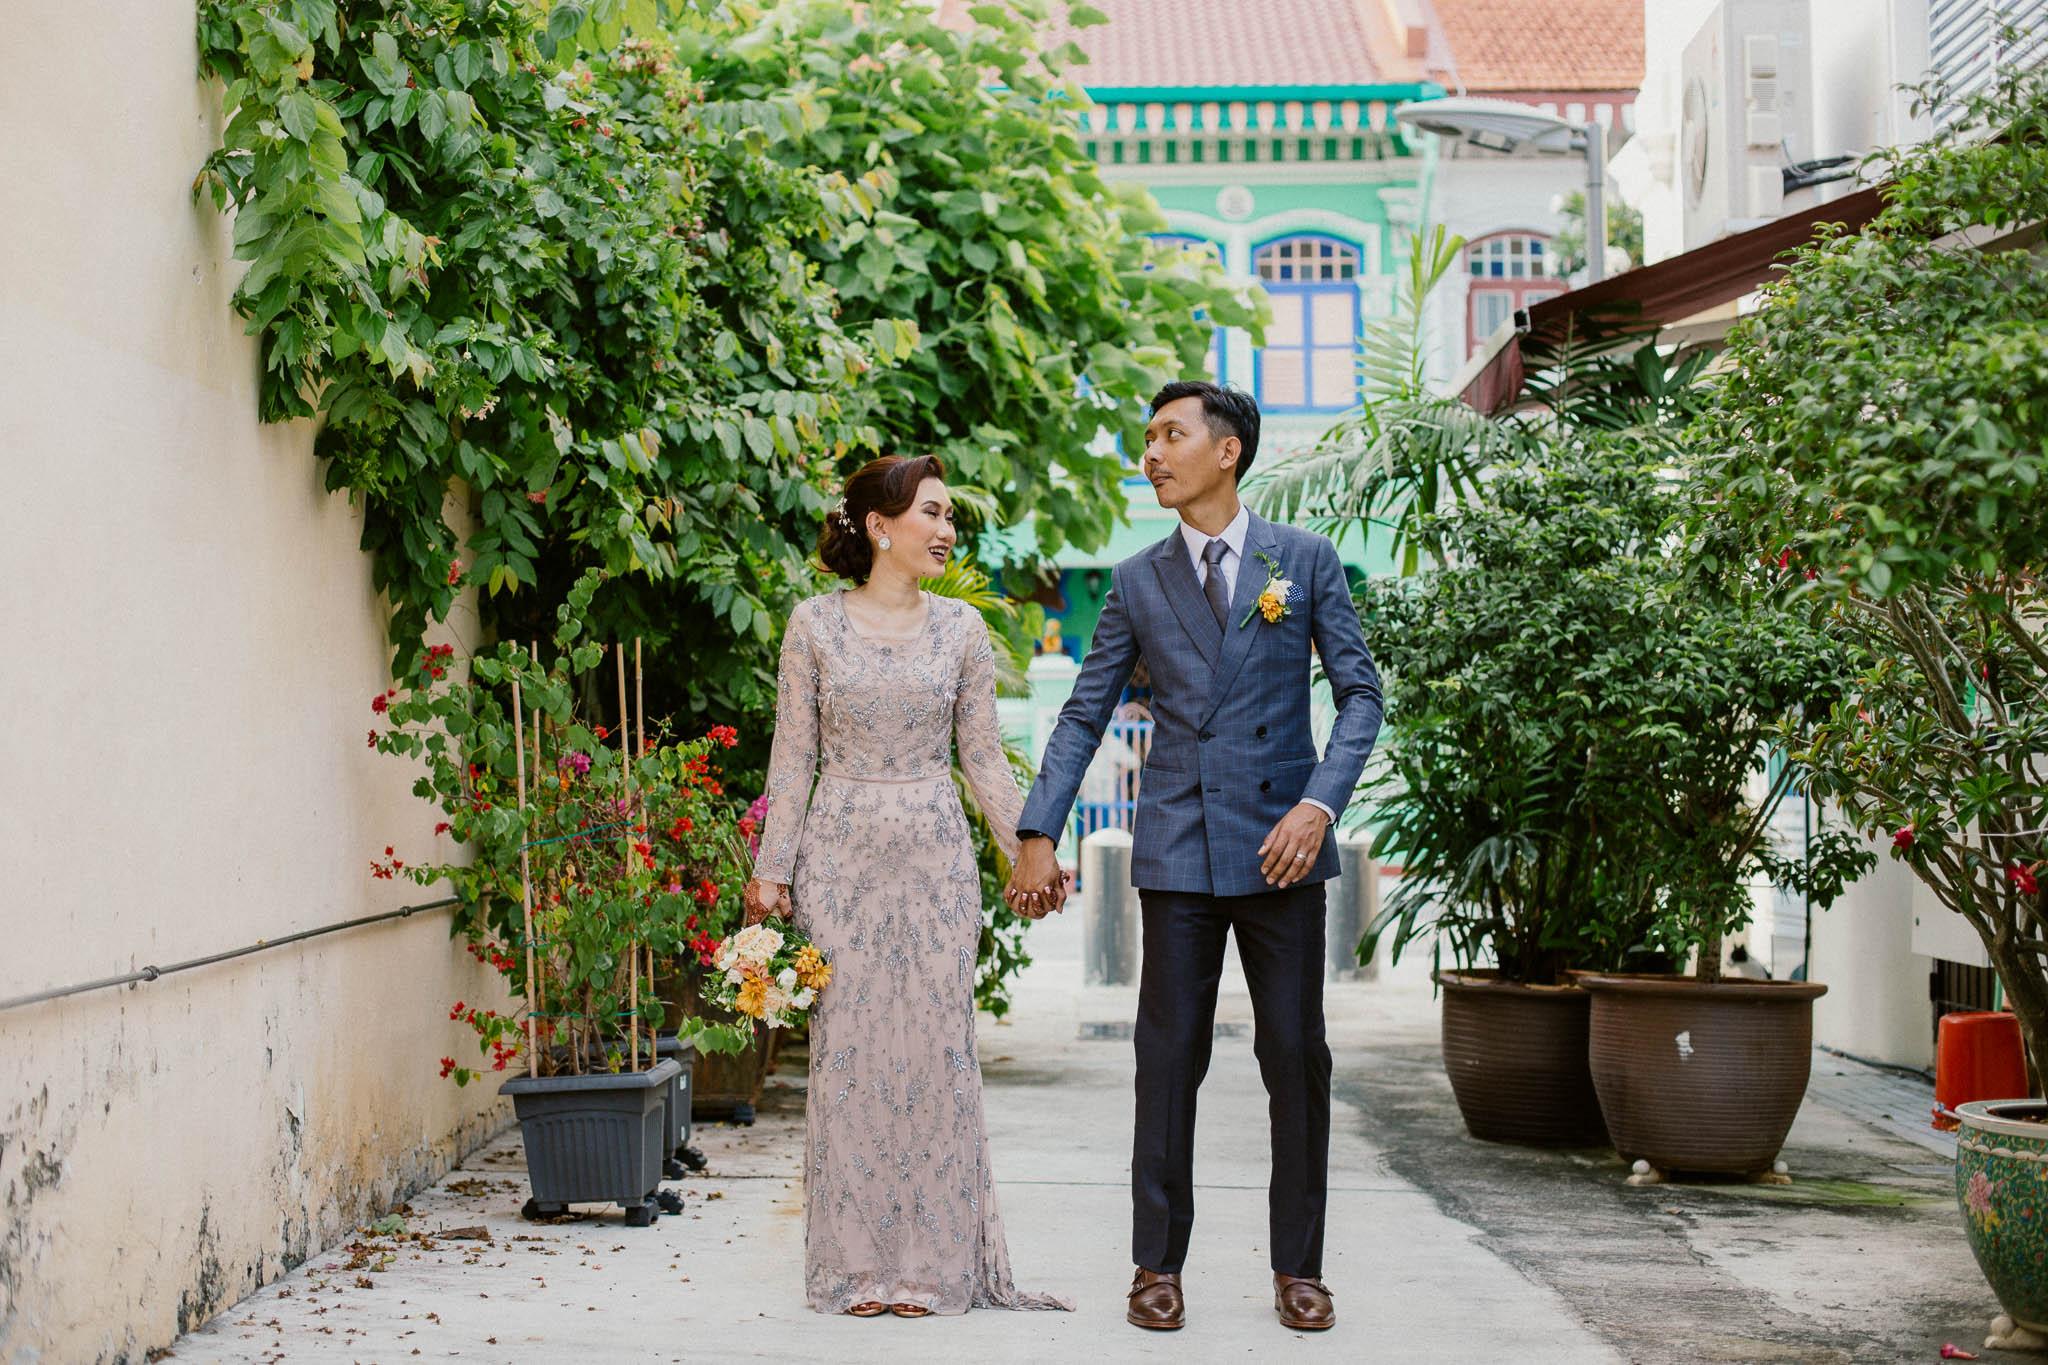 singapore-wedding-photographer-addafiq-nufail-085.jpg